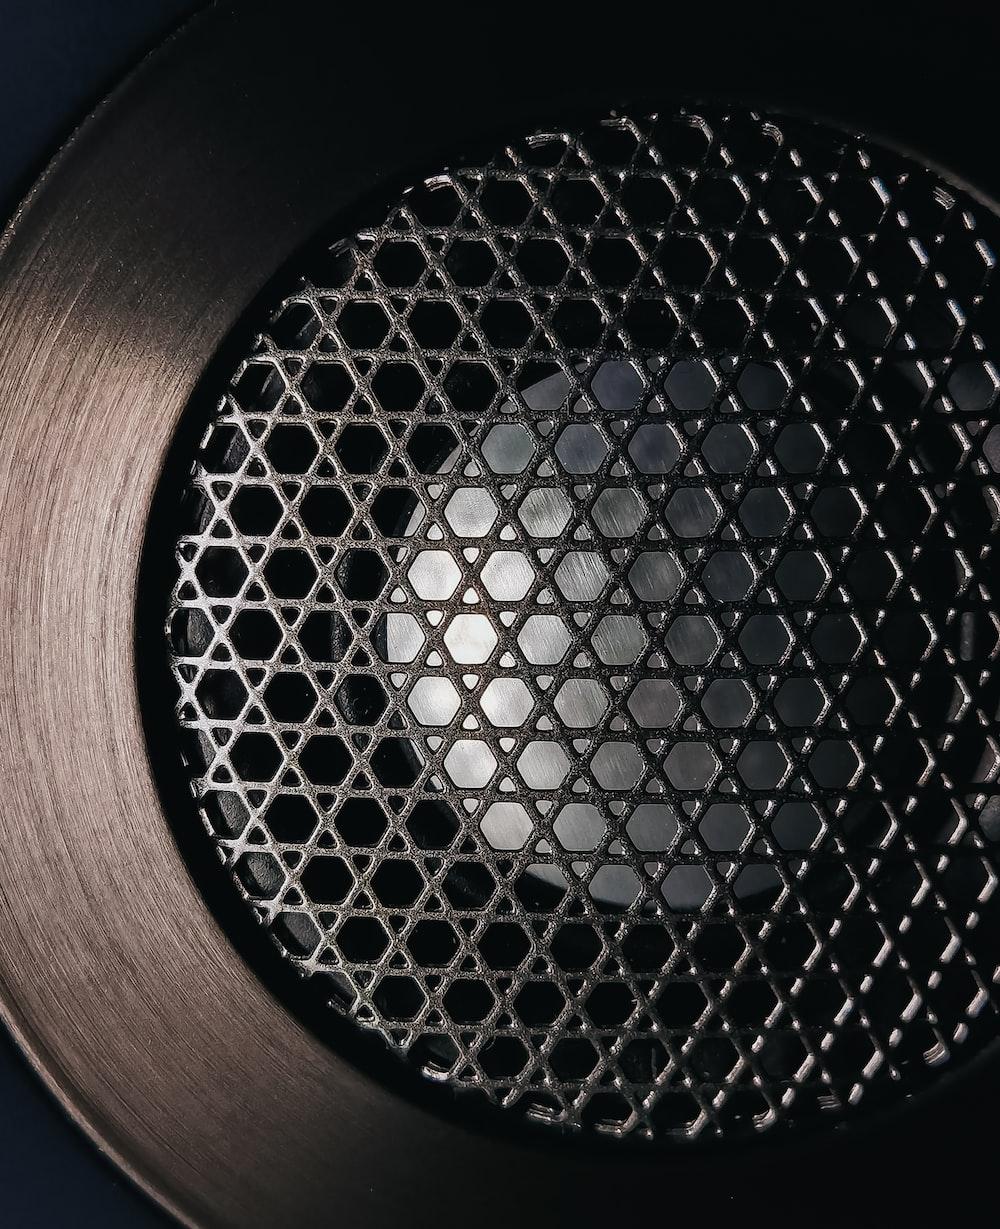 brown and black round speaker